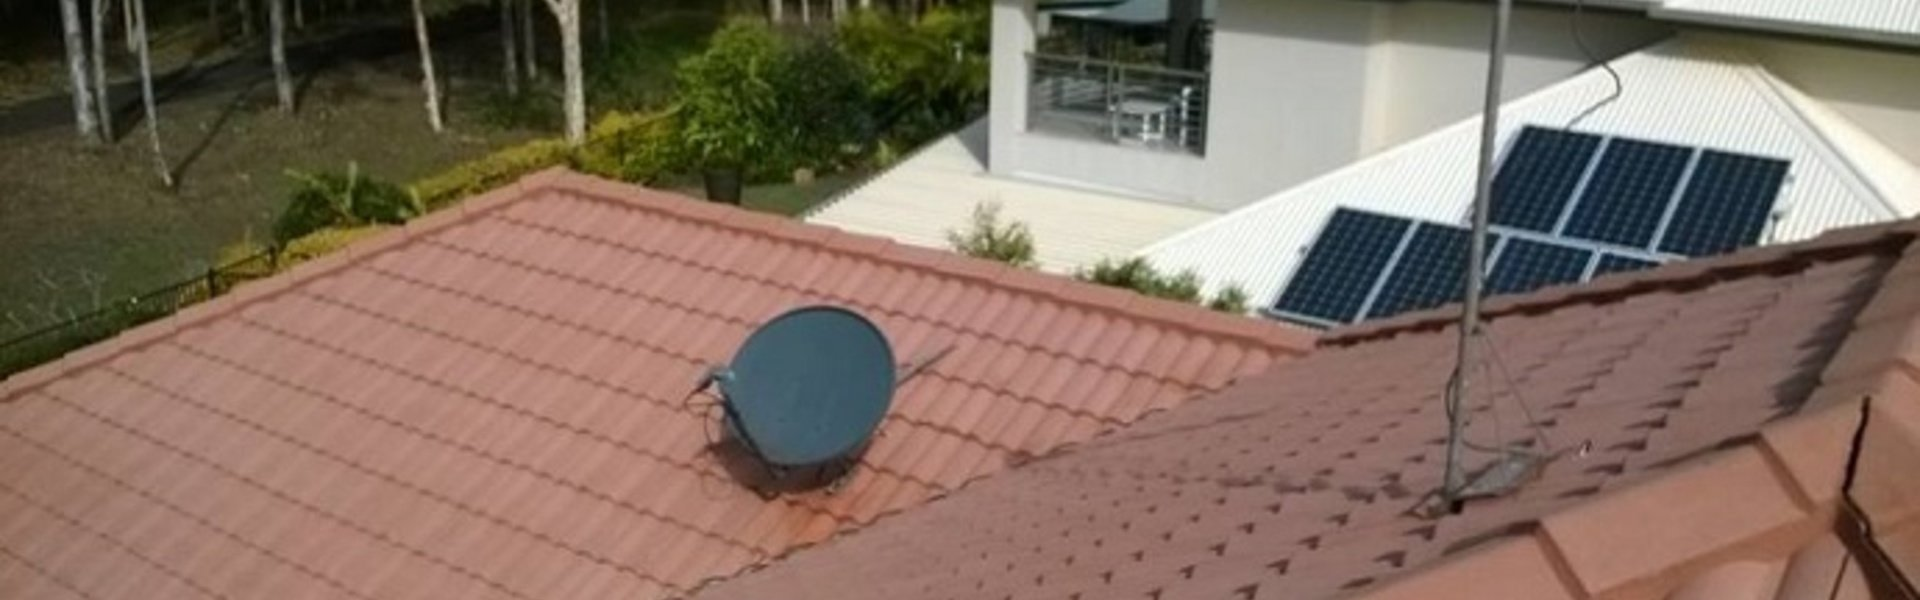 Concrete_Roof_Tiles_Mould_Removal_Sunshine_Coast_QLD.jpg